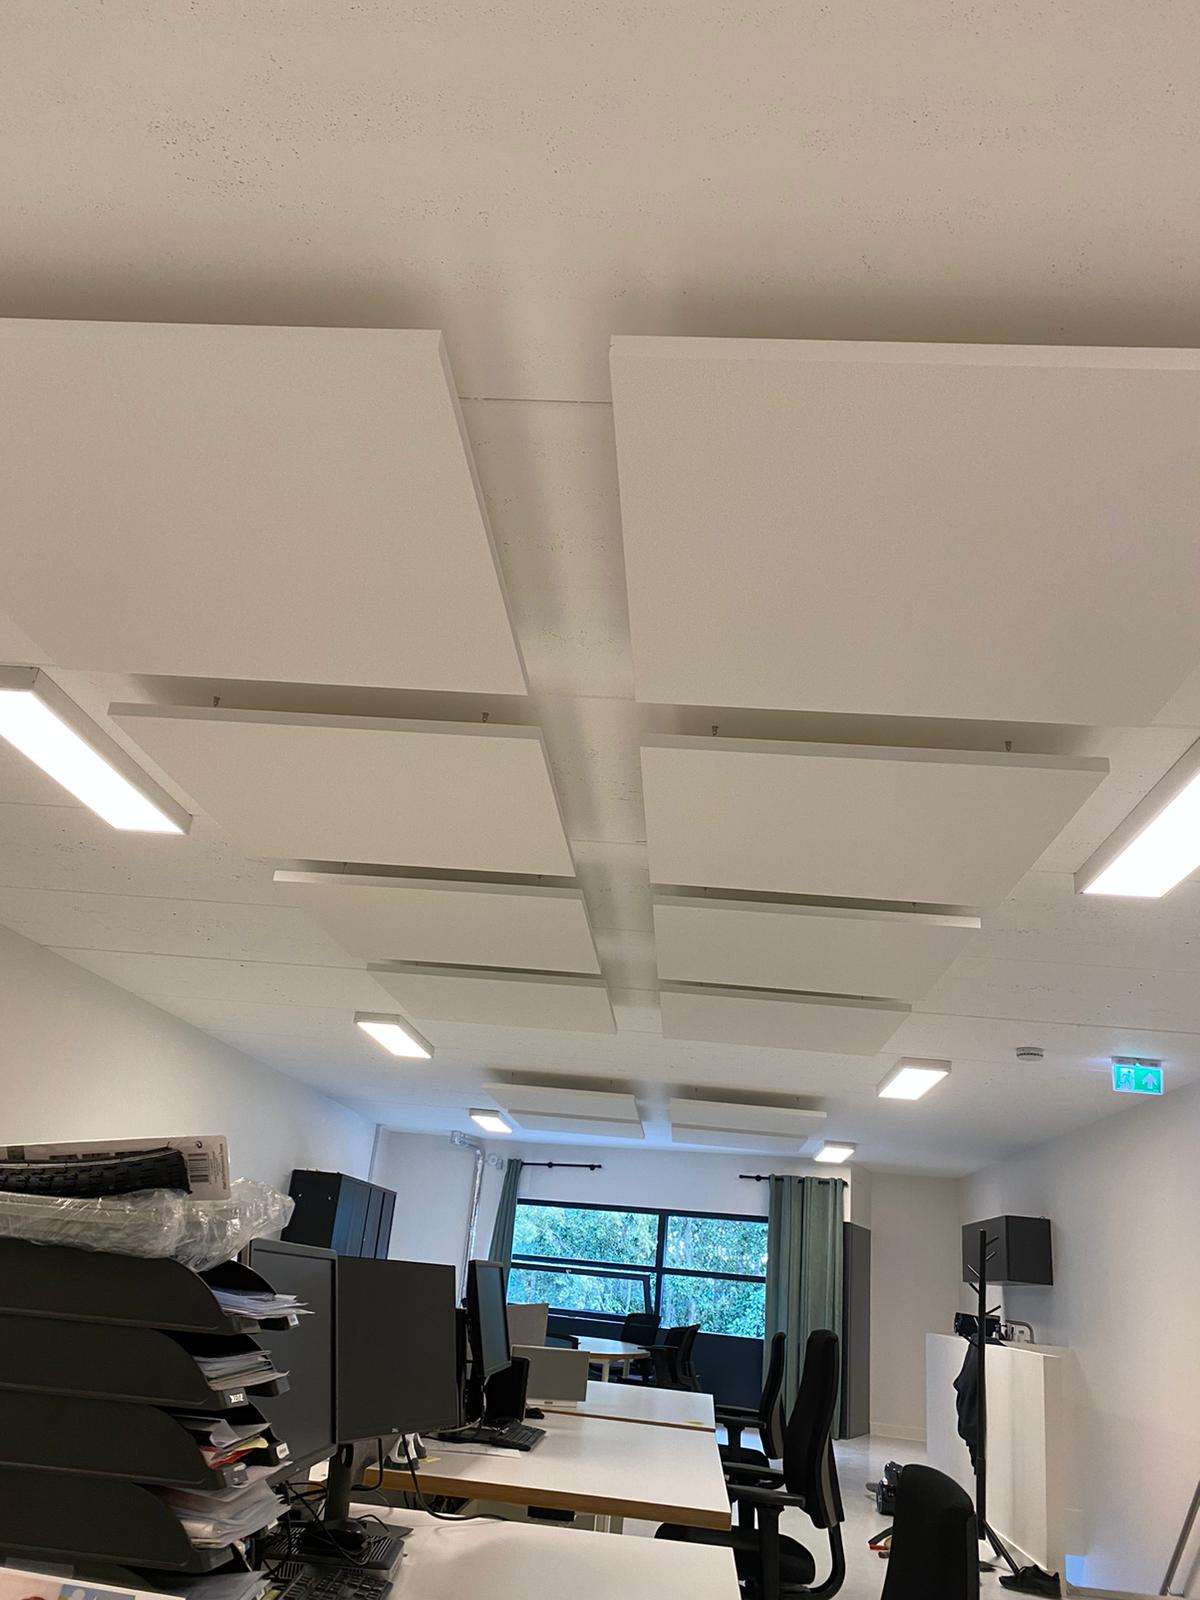 S.P. CeilingTrading plafondeilanden